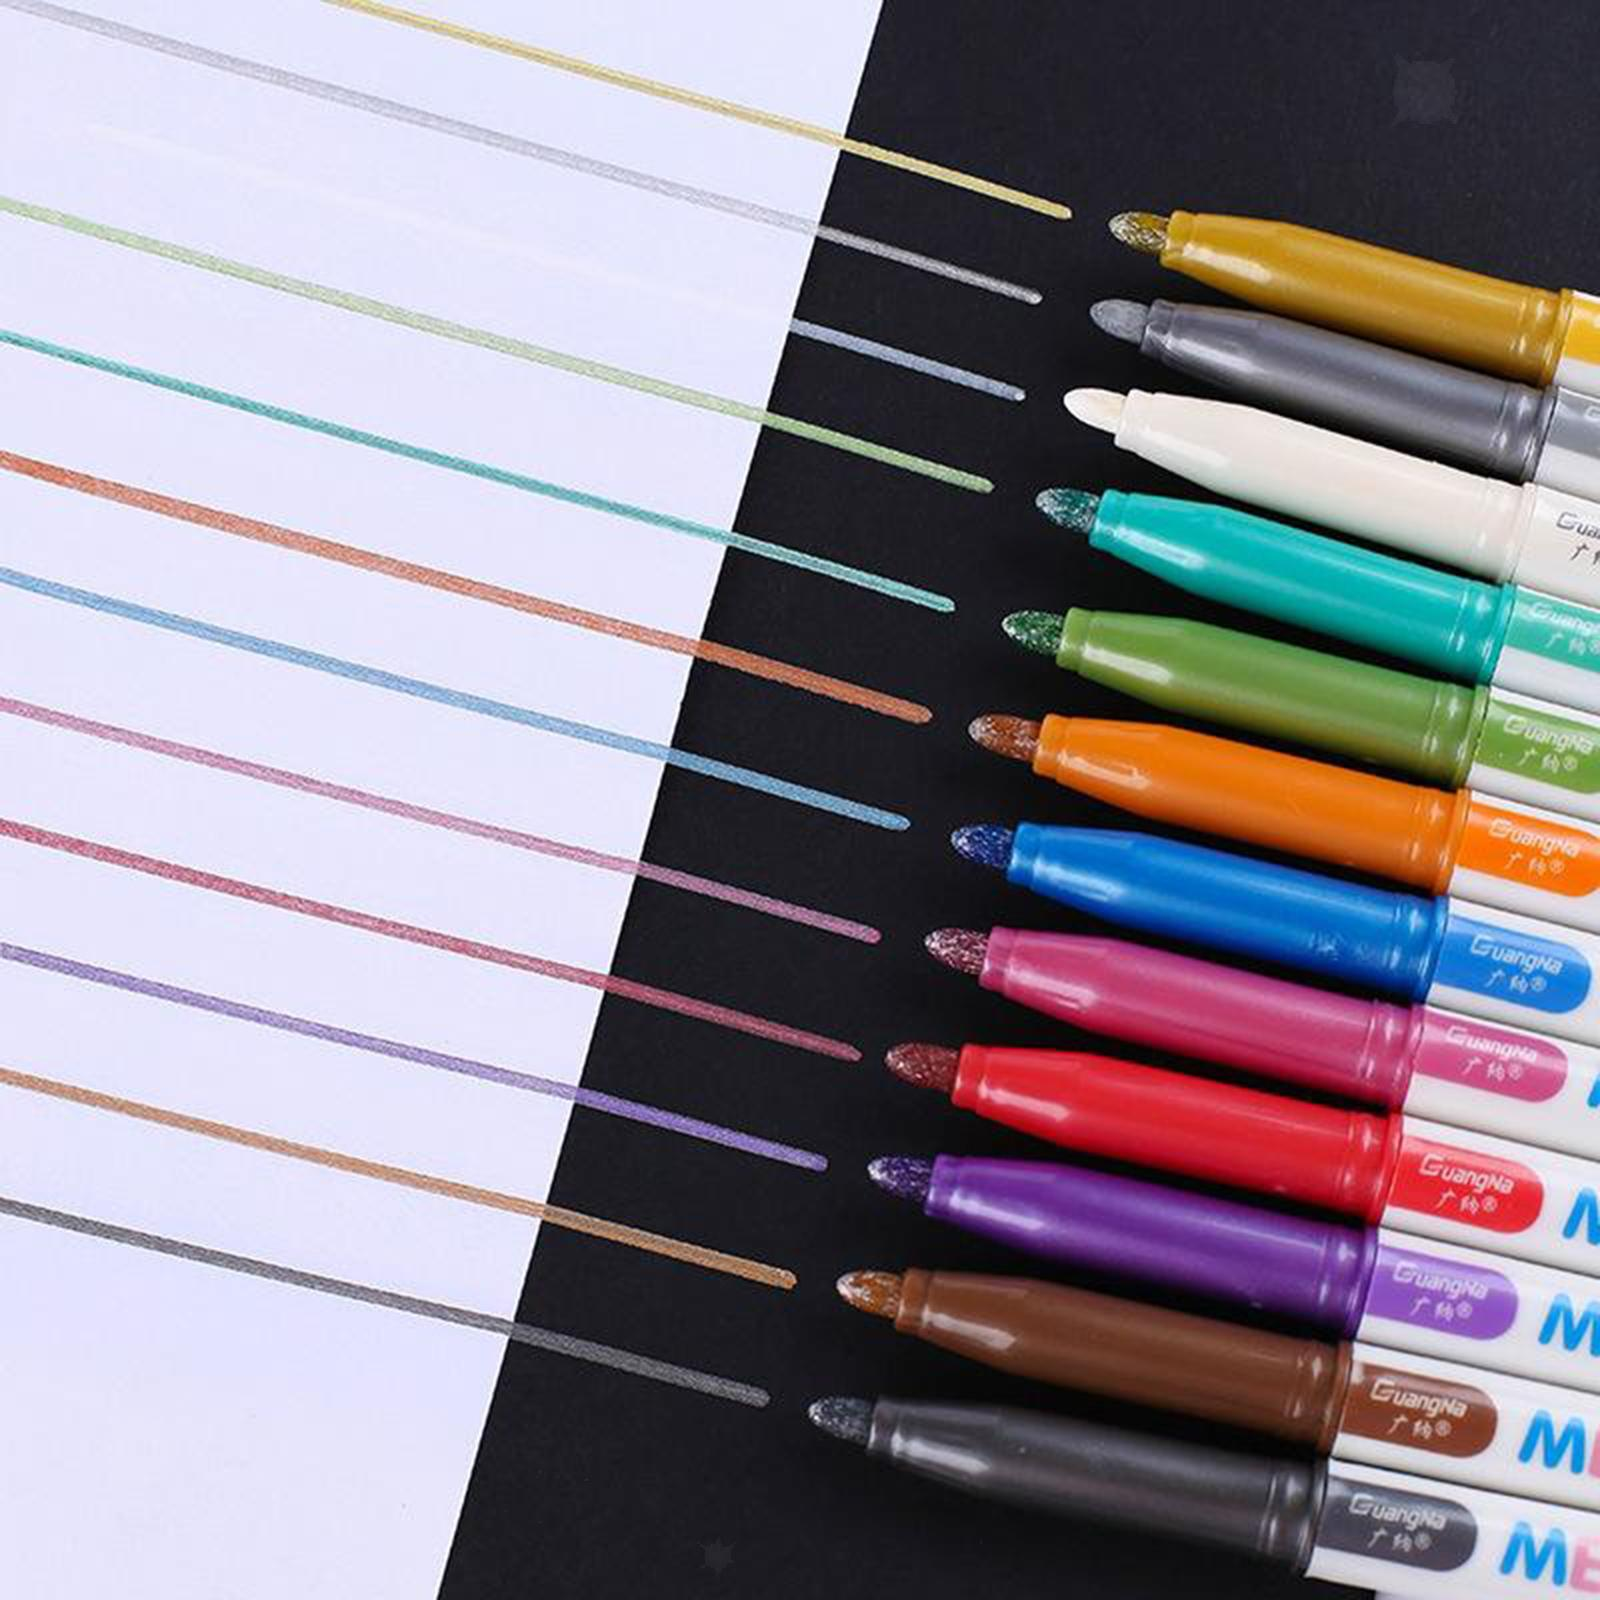 miniatura 18 - 8-12-20x-Permanente-Metallic-Marcatori-Vernici-Penne-per-Adulti-Colouring